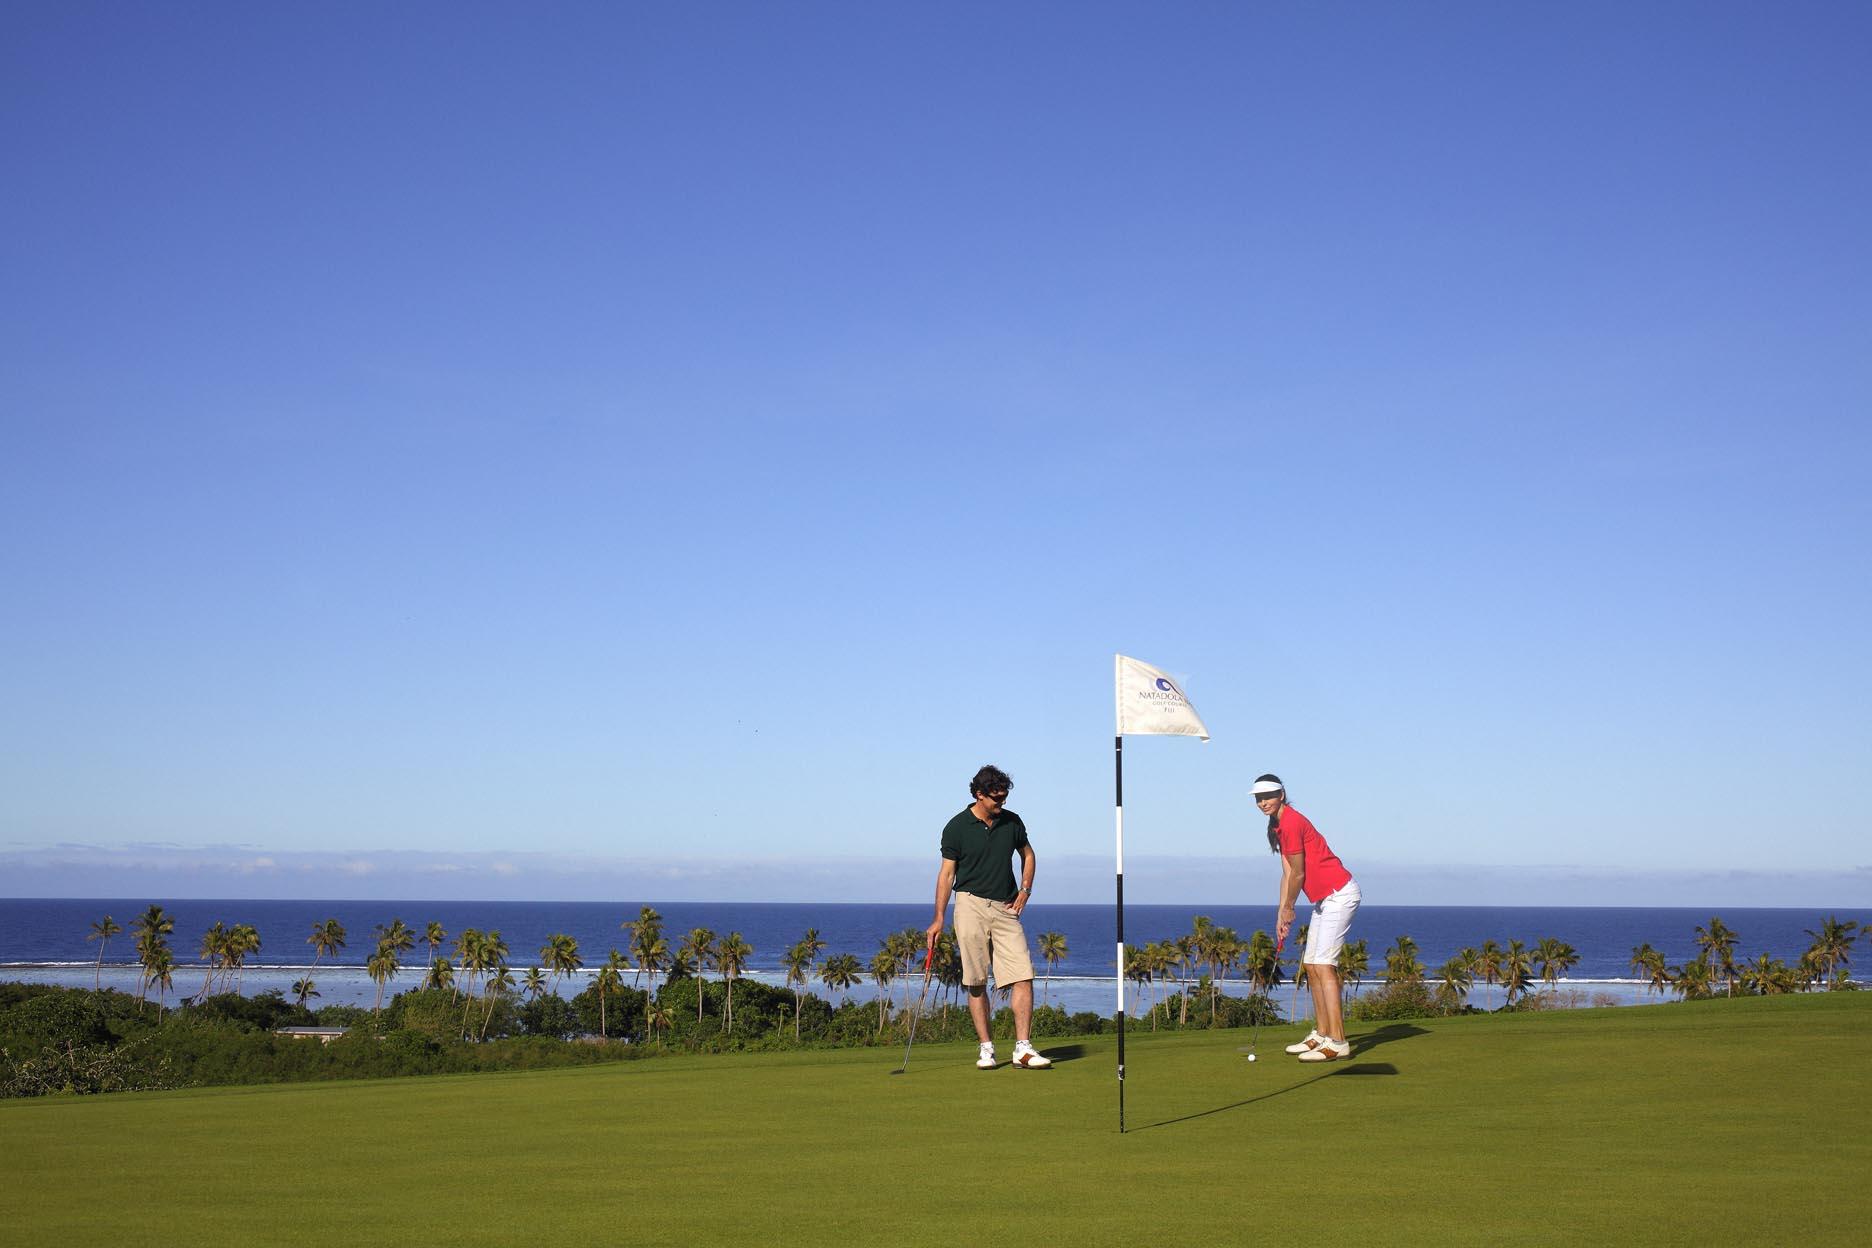 Natadola-Golf-Images1872x1248.jpg